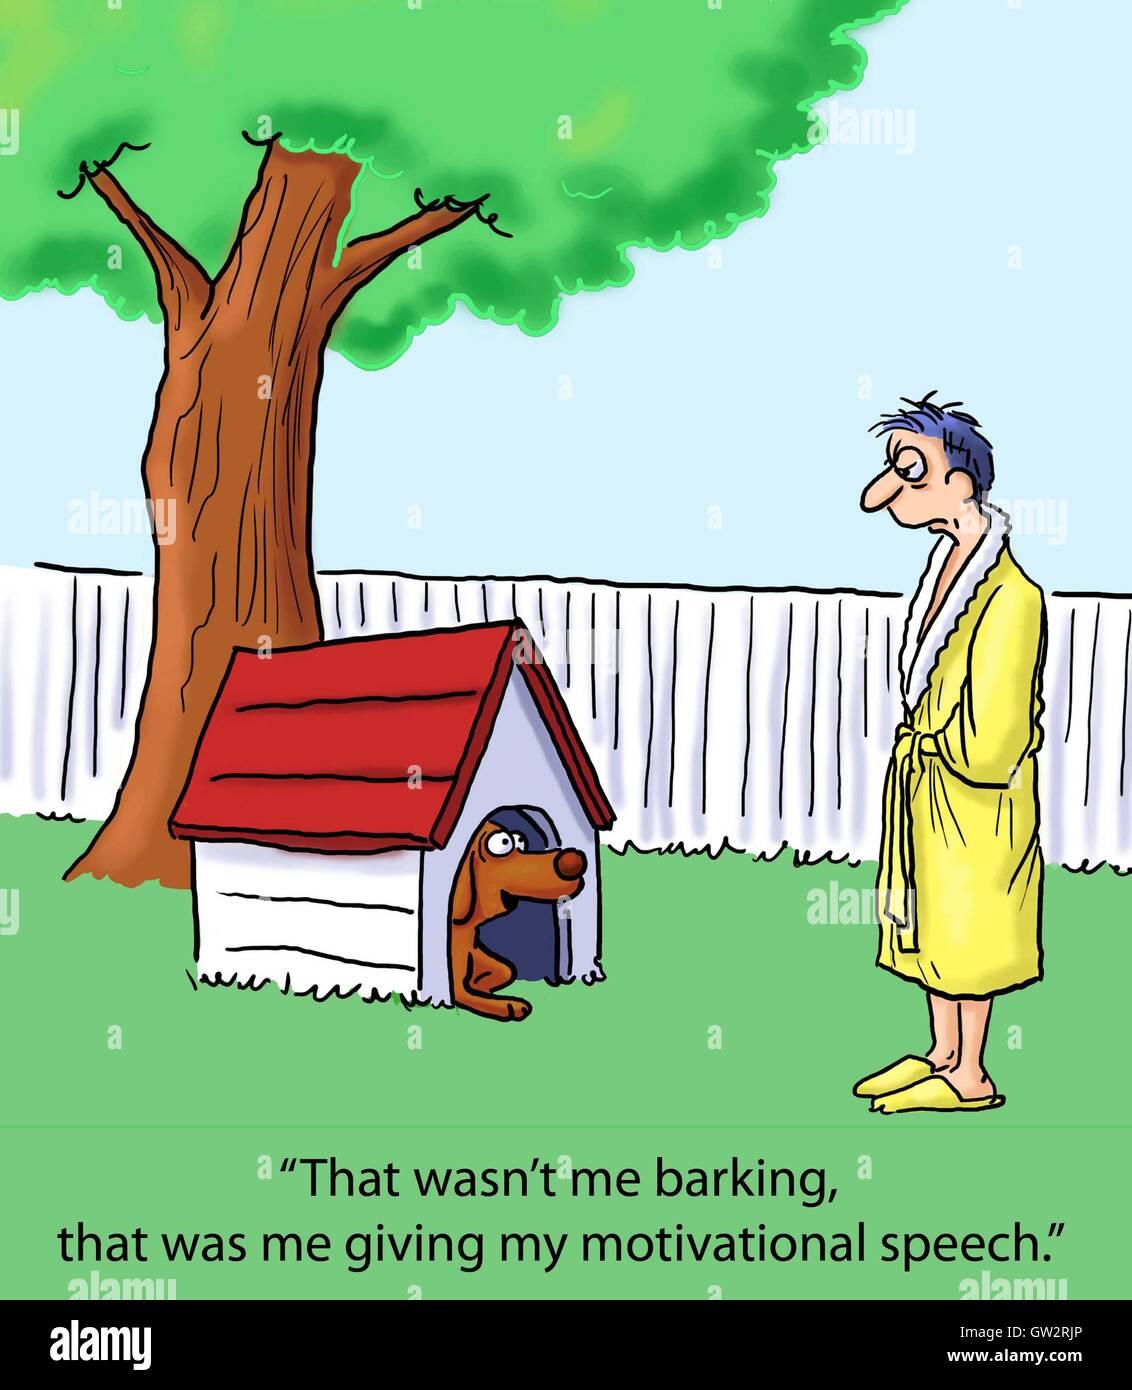 Humor Inspirational Quotes: Motivation Cartoon Stock Photos & Motivation Cartoon Stock